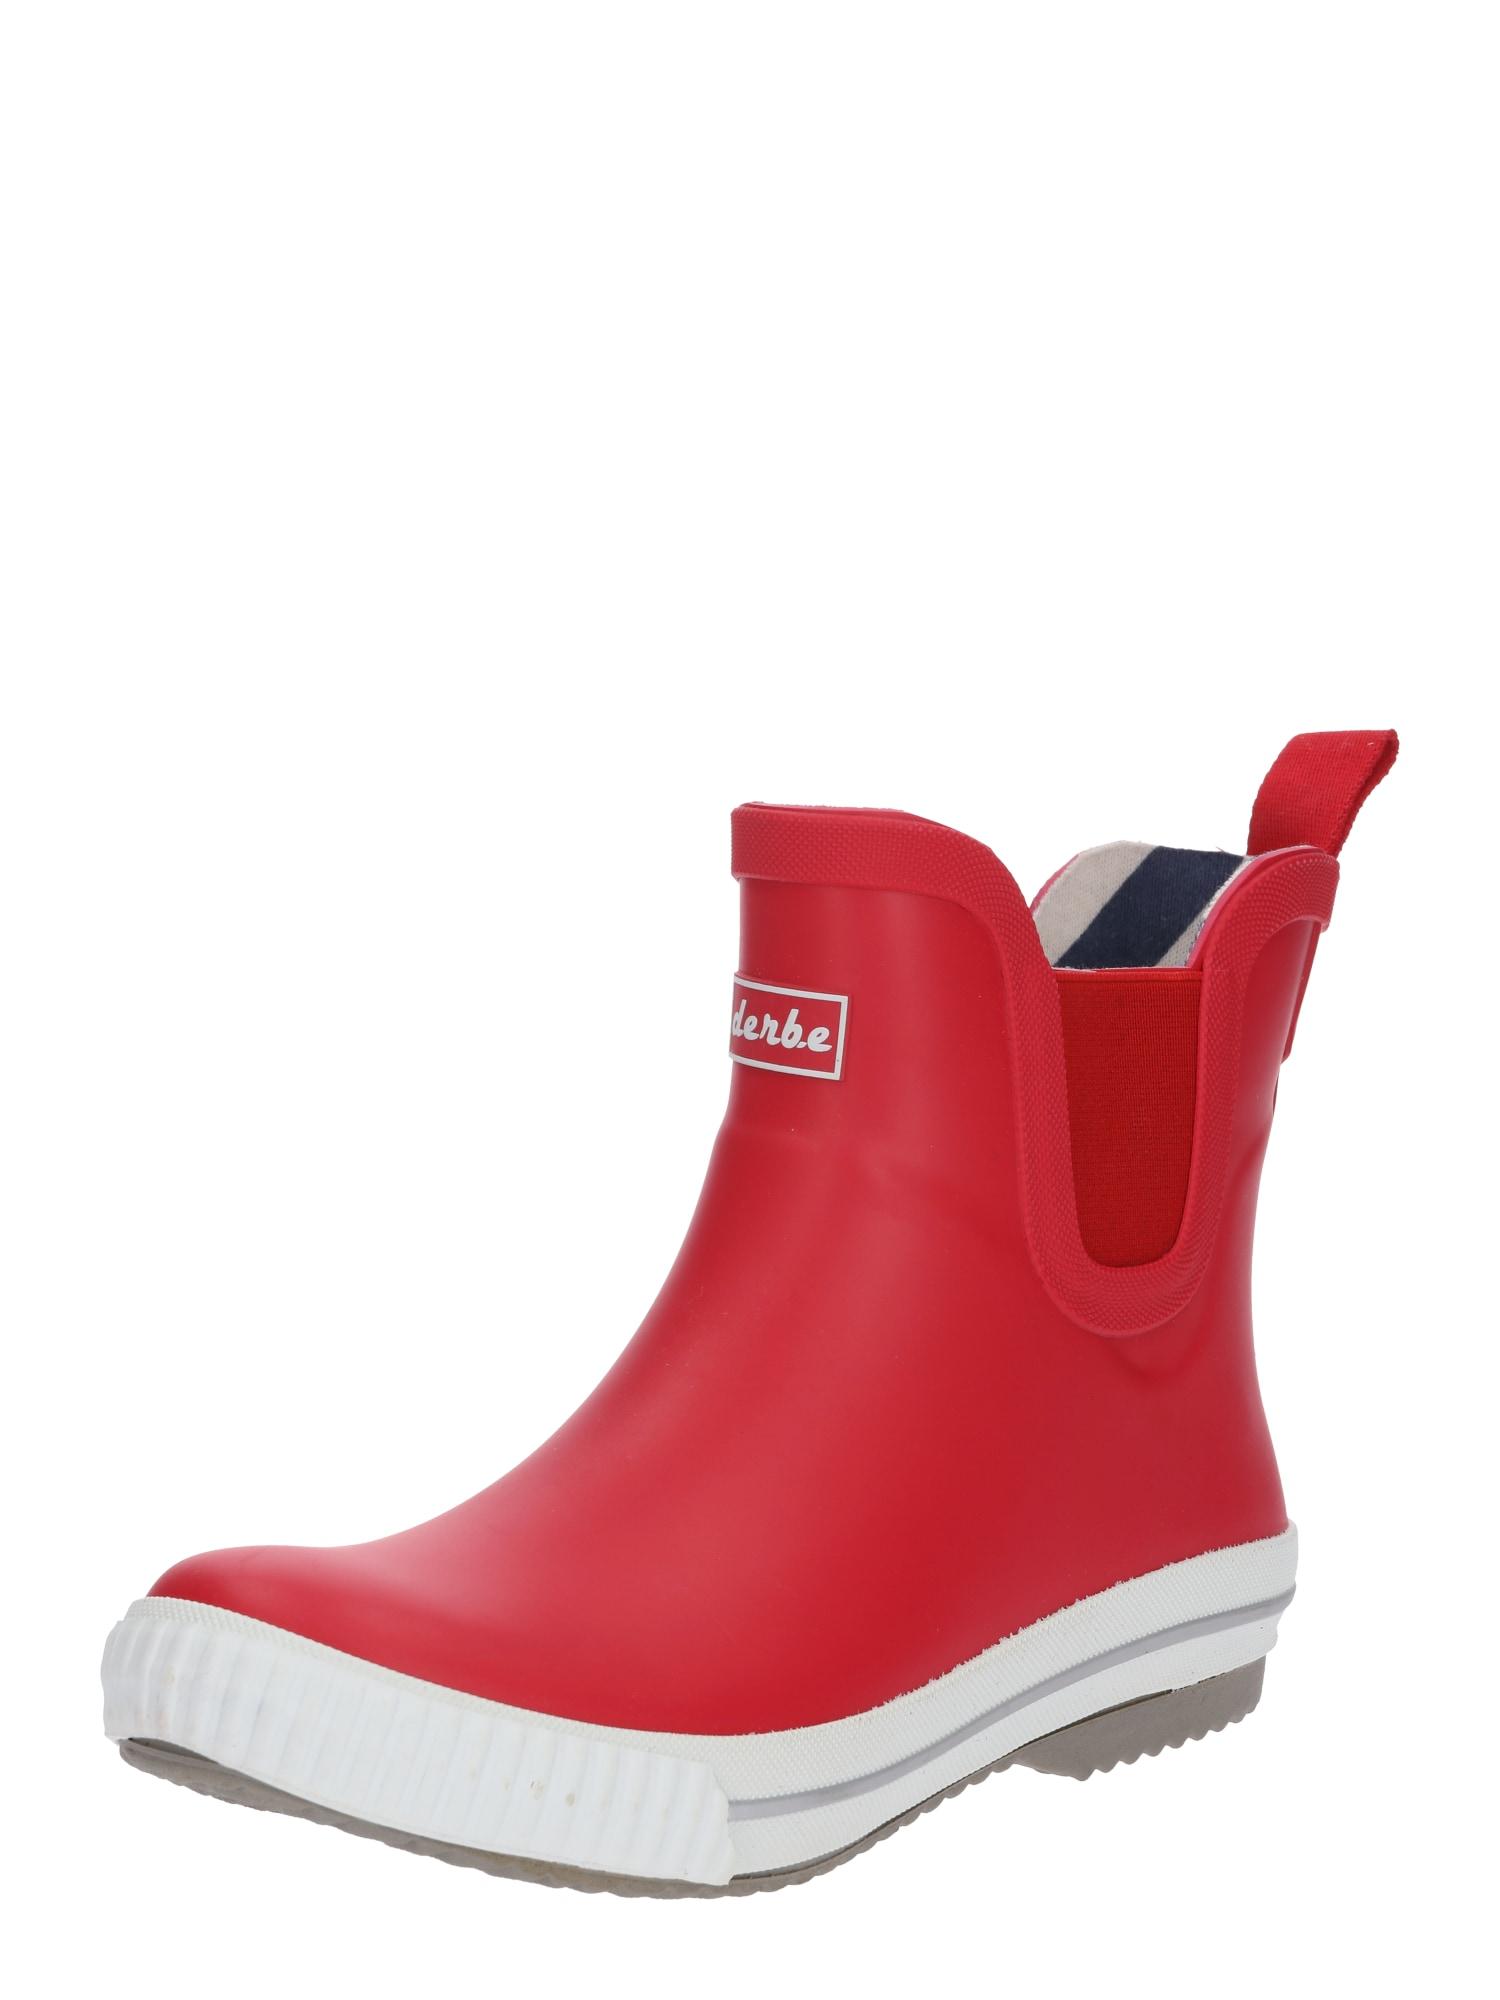 Derbe Guminiai batai 'Wattpuuschen' vyšninė spalva